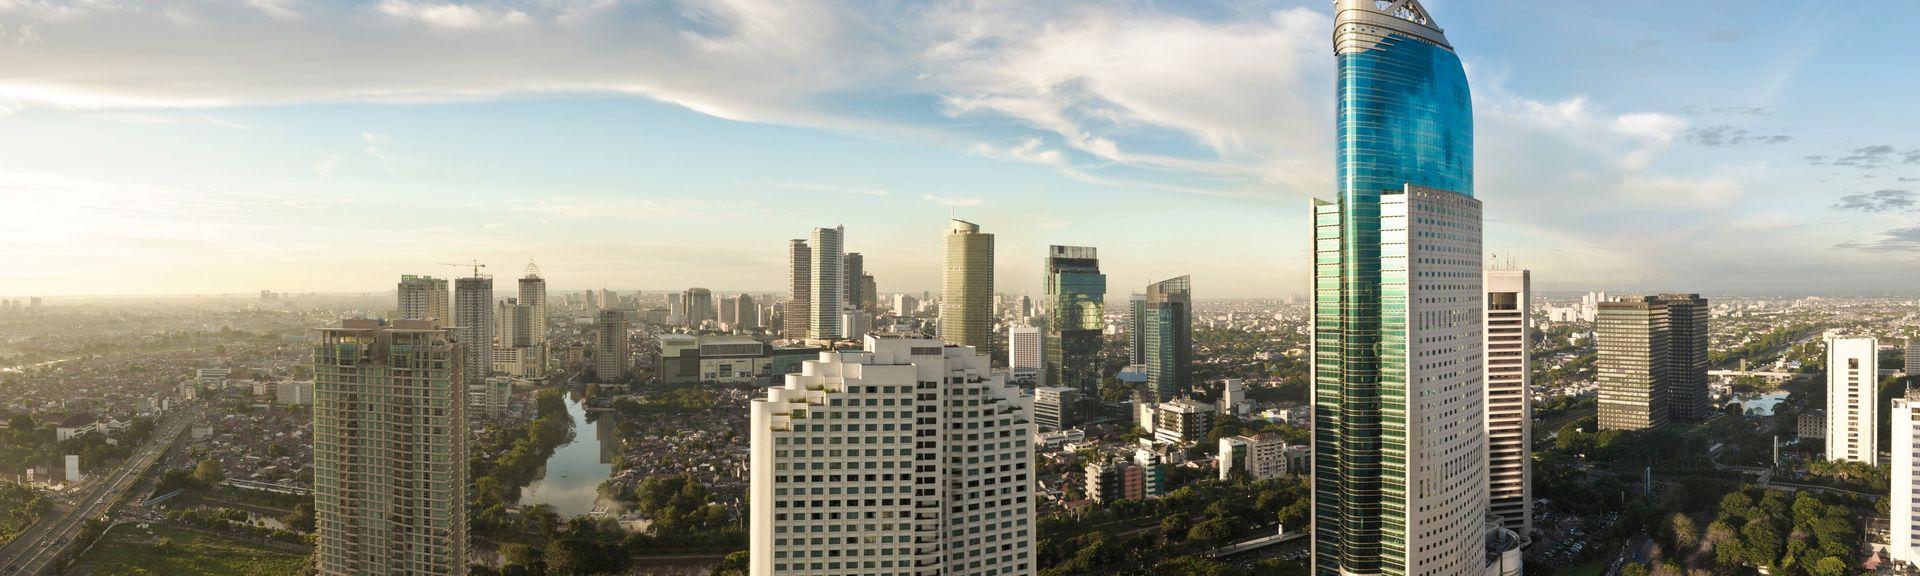 Jakarta, Jakarta, Indonesien